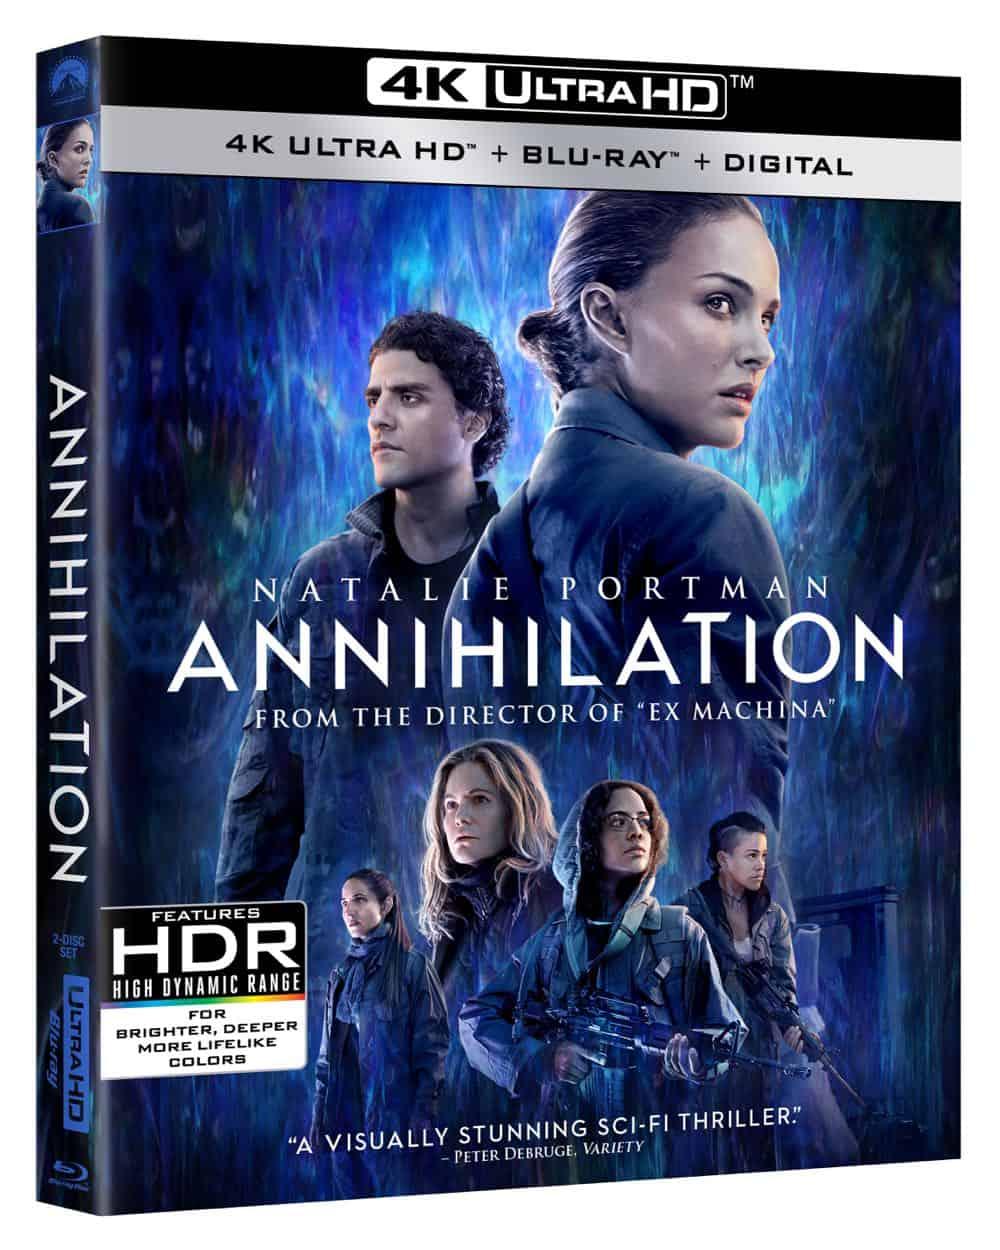 ANNIHILATION 4K + Blu-ray + Digital Cover